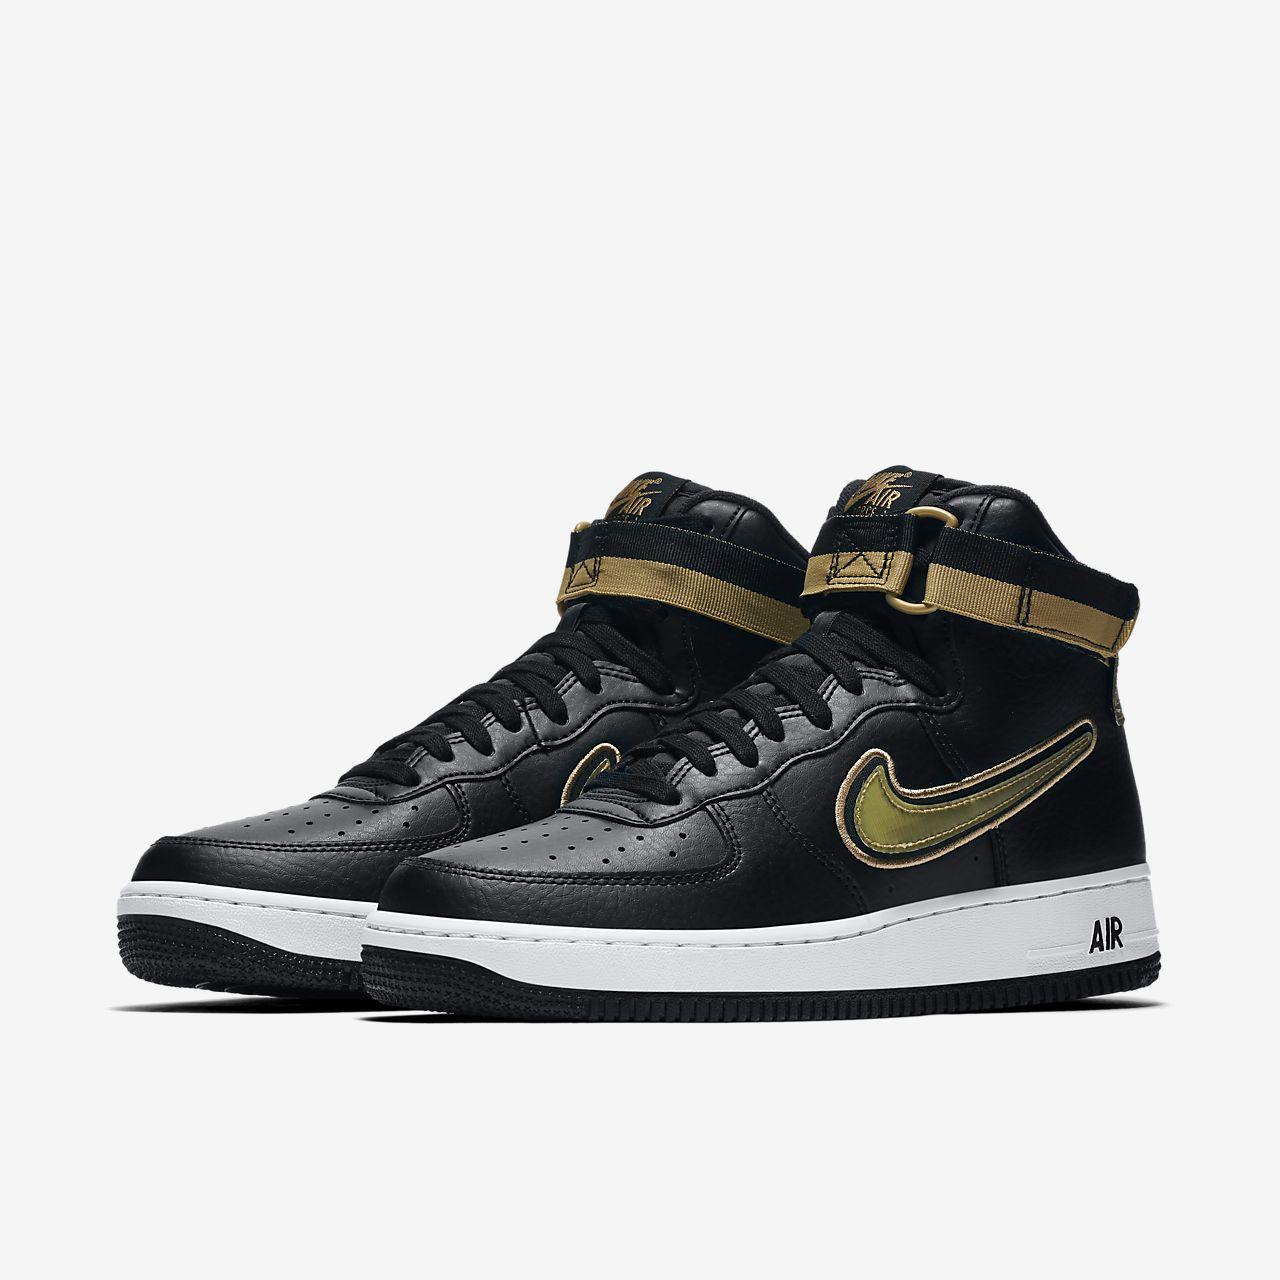 0a40f82f84e Nike Air Force 1 High '07 LV8 Sport NBA Herenschoen. Nike.com NL